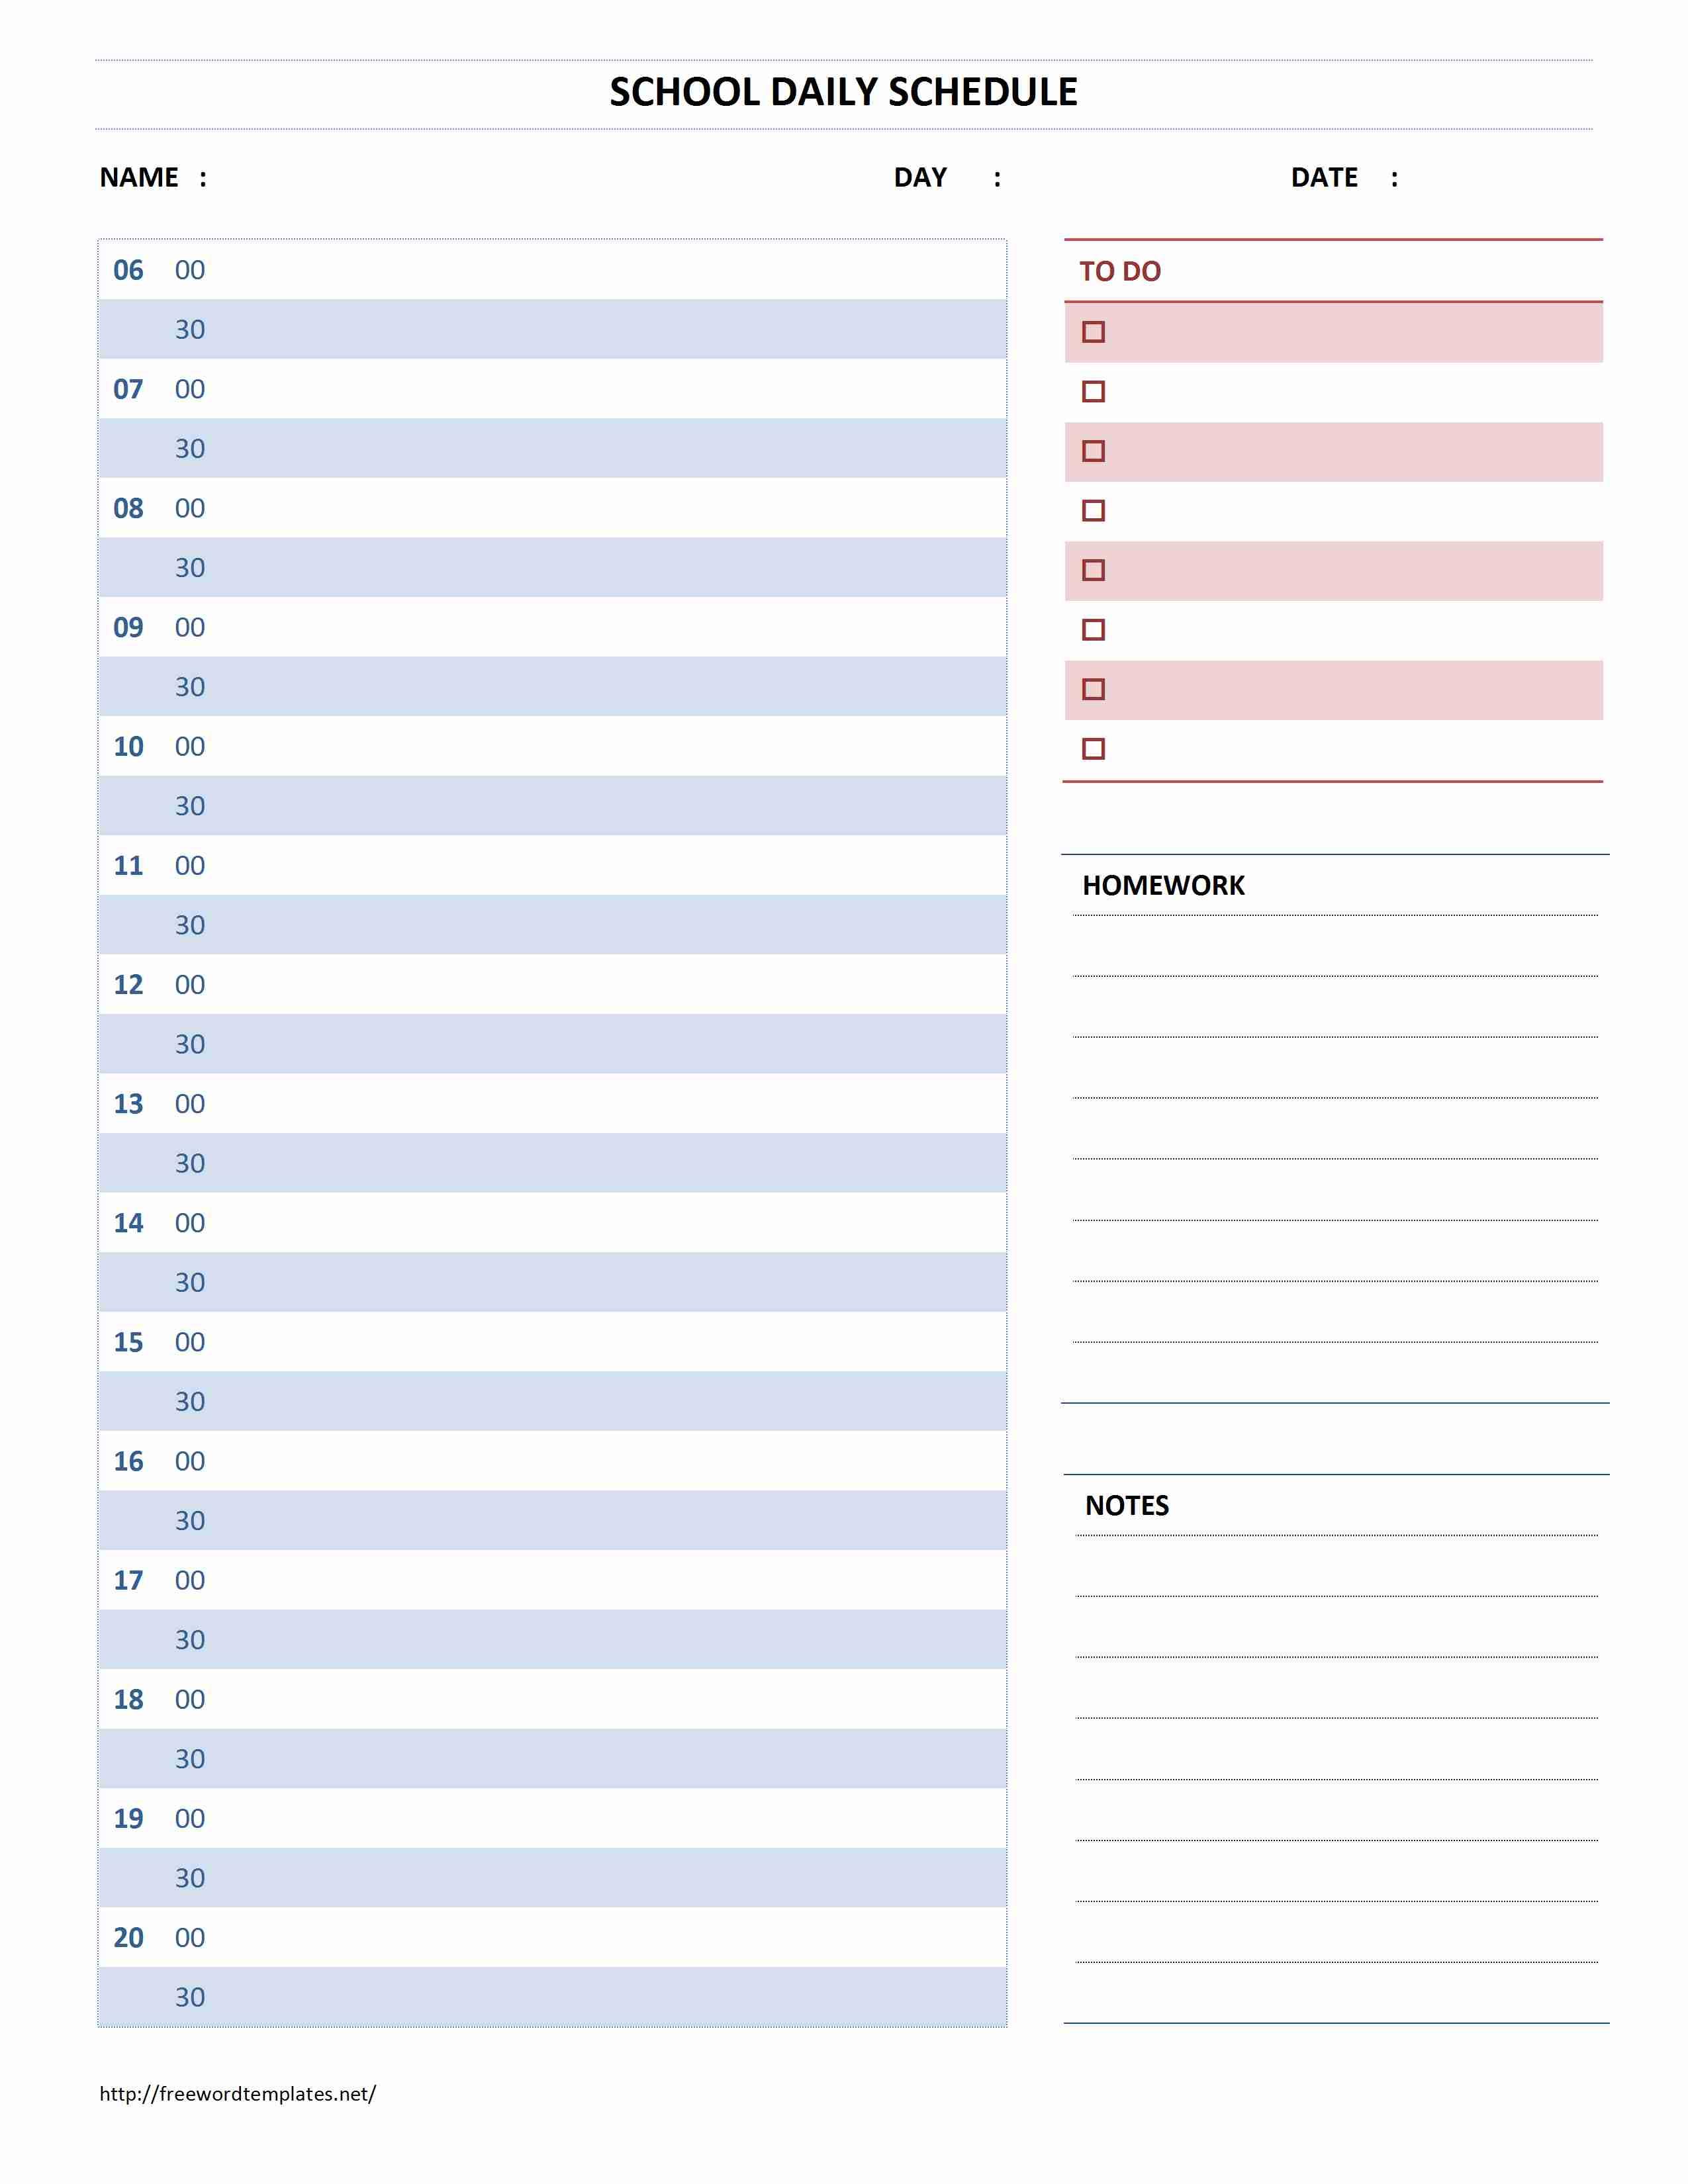 School Daily Schedule | Freewordtemplates.net